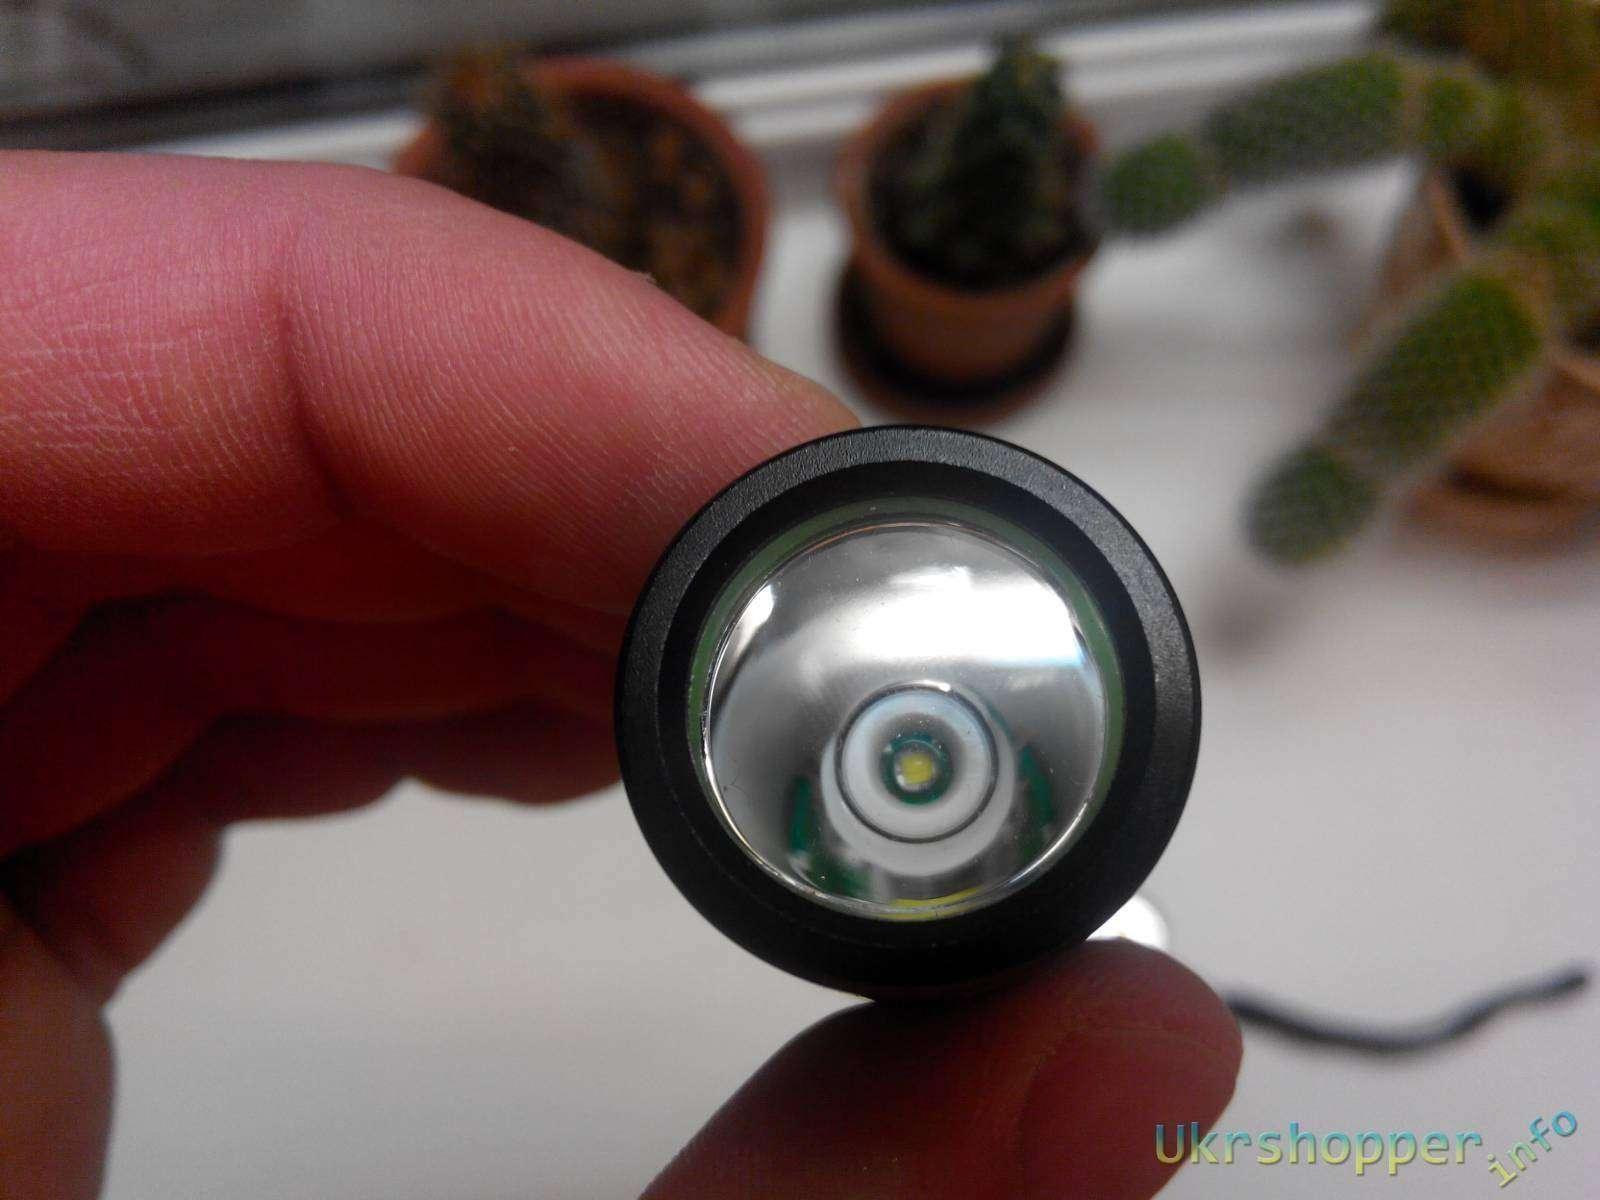 BuyinCoins: Хороший фонарь за недорого UltraFire 600lumen 18650 S6 Cree Q5